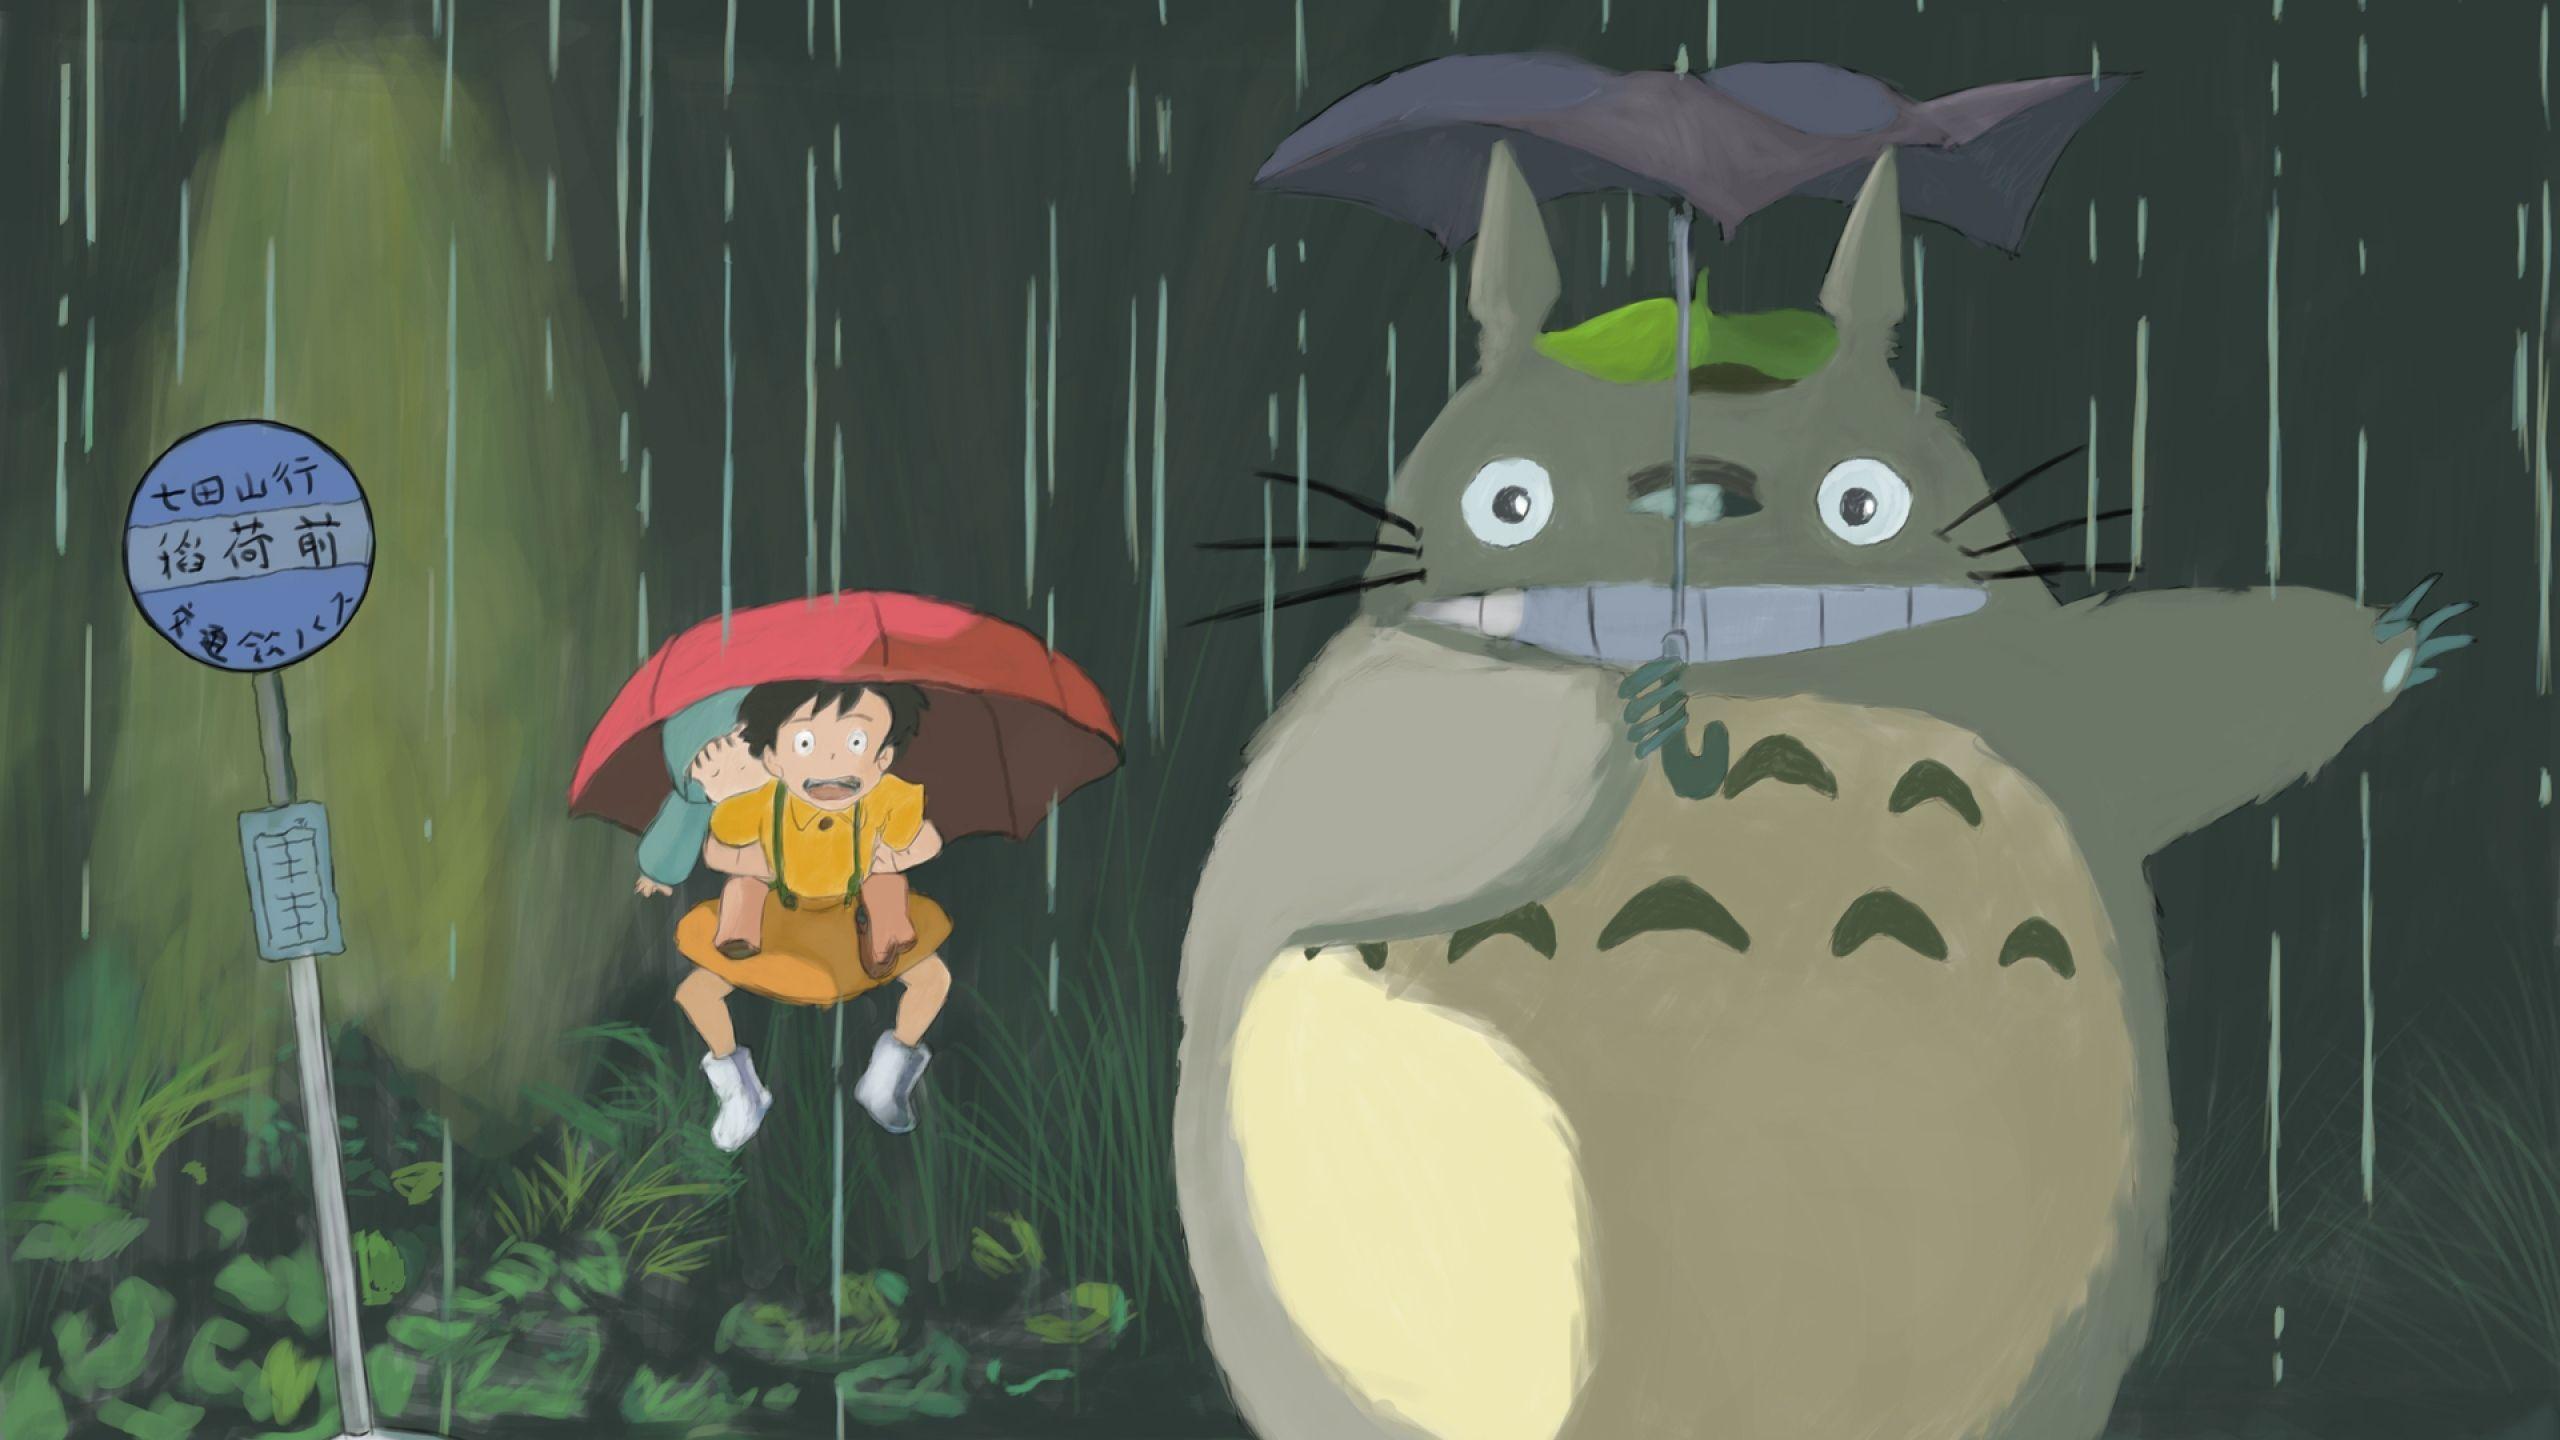 Download Wallpaper 2560x1440 Totoro Hayao Miyazaki Rain